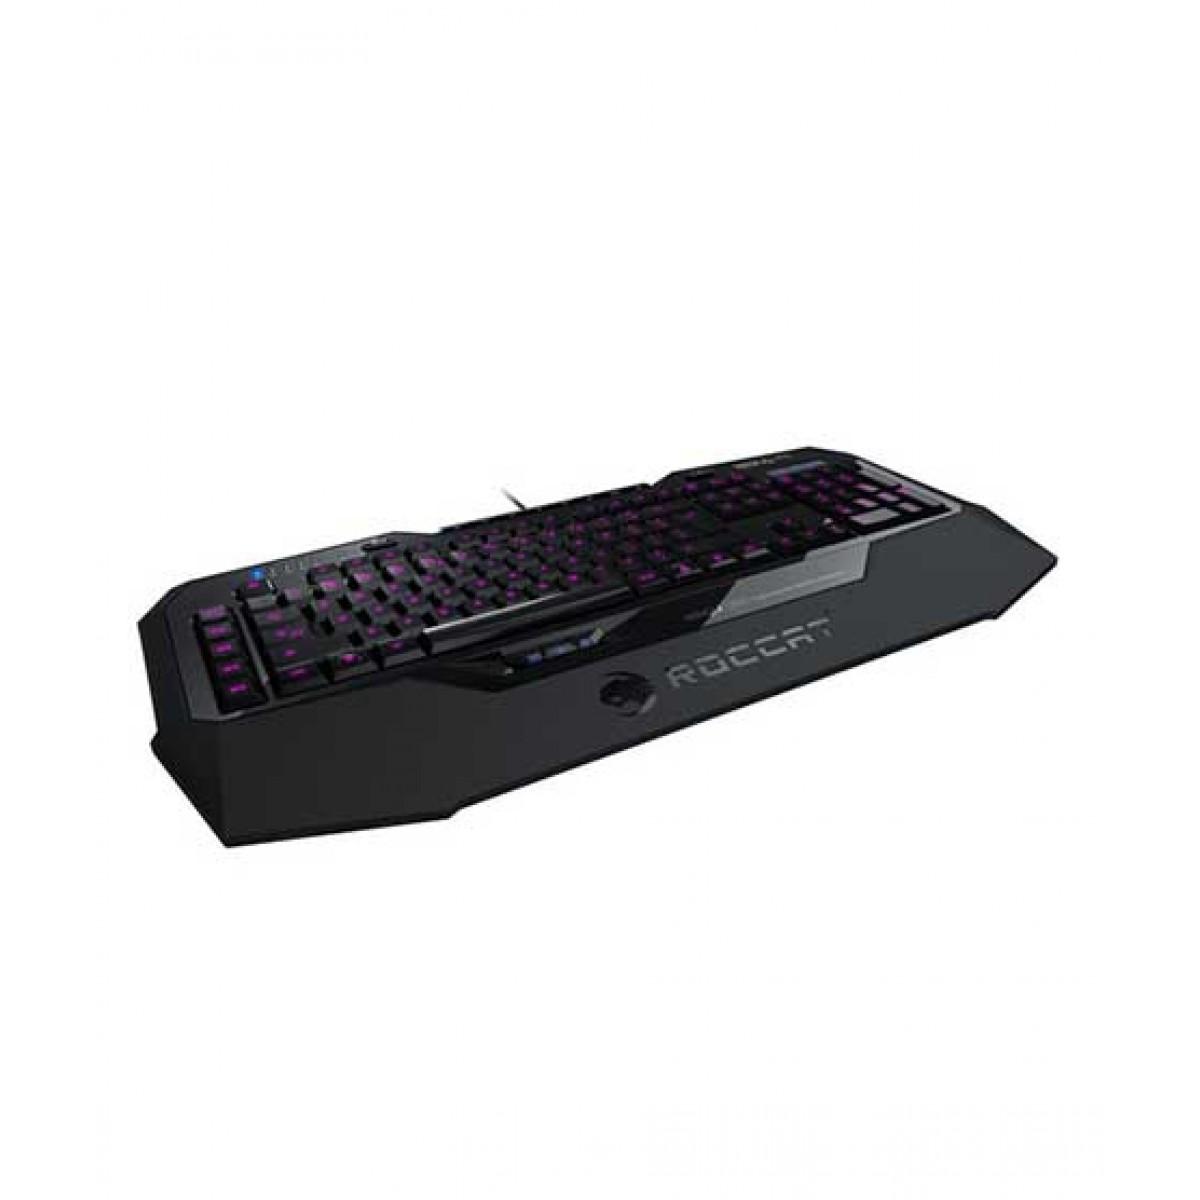 Roccat Isku=FX=MultiColor Gaming Keyboard Black